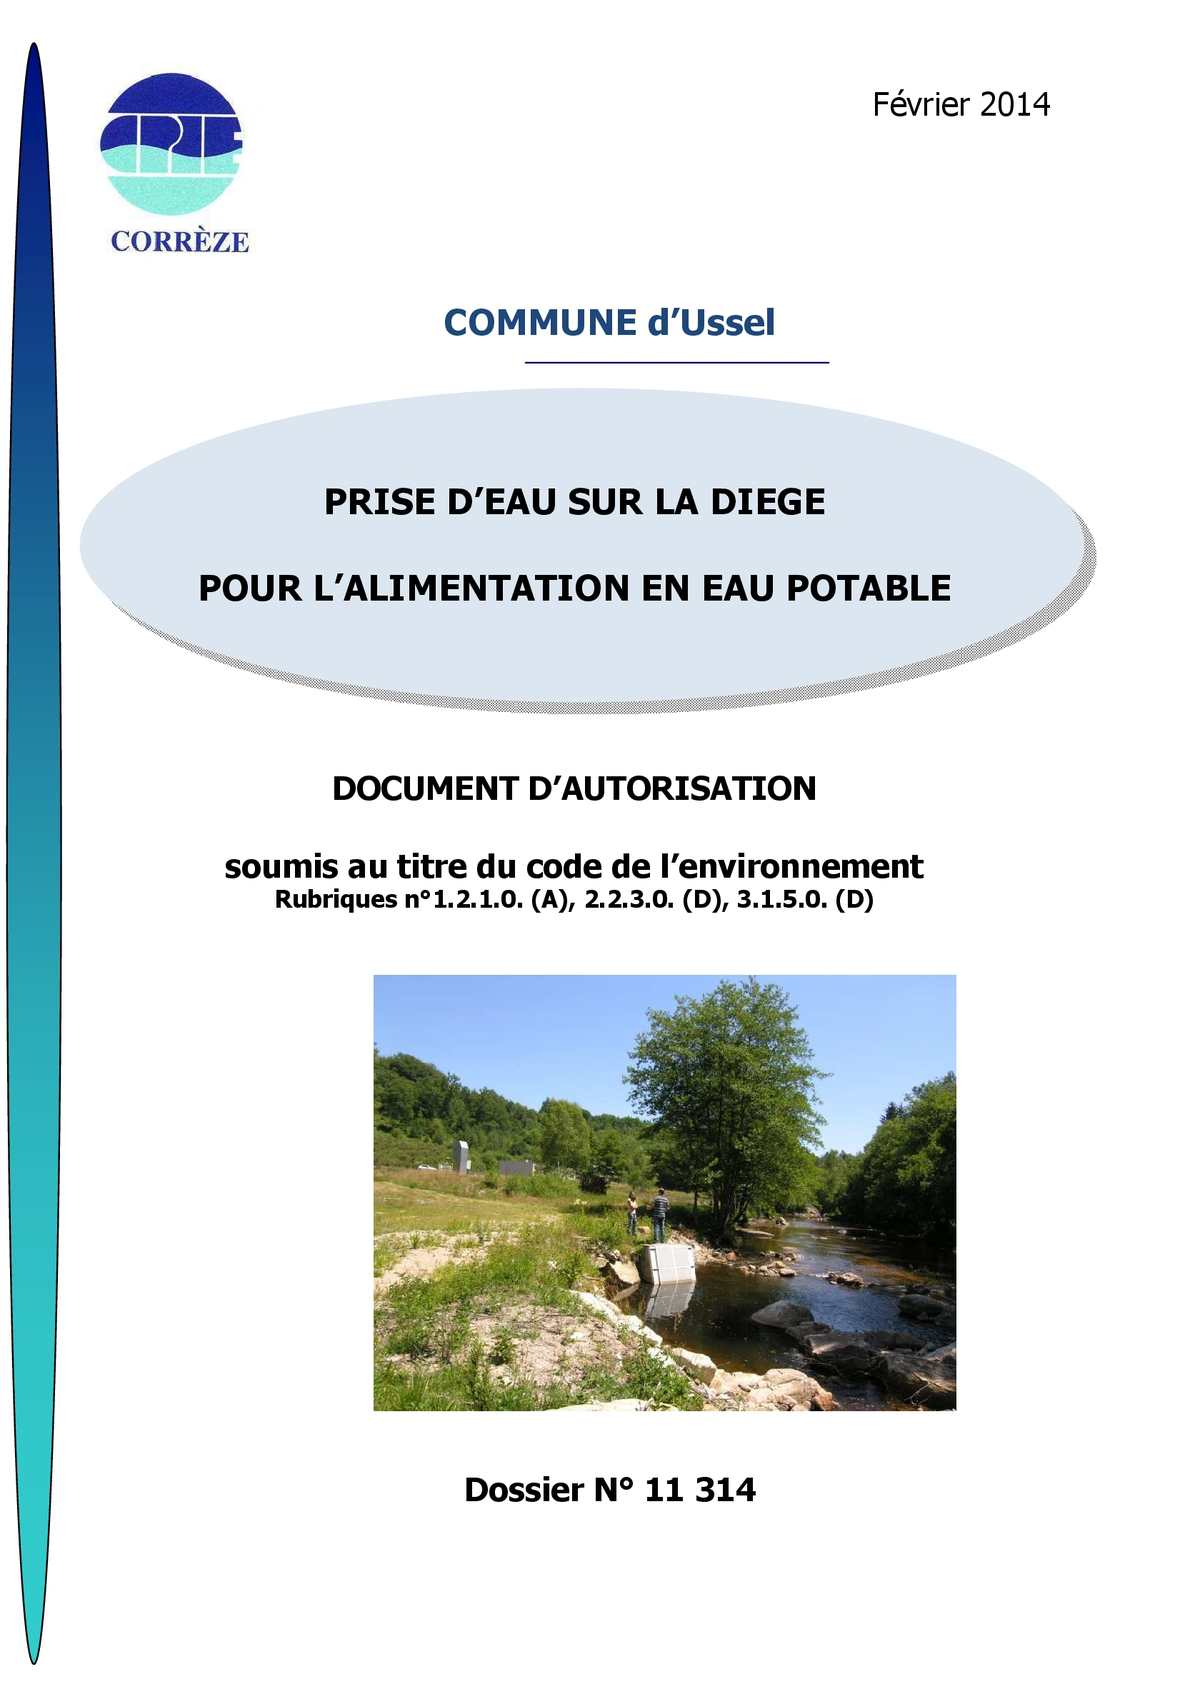 Massif Paysager Luxe Calaméo Doc Autorisation Code Environnement